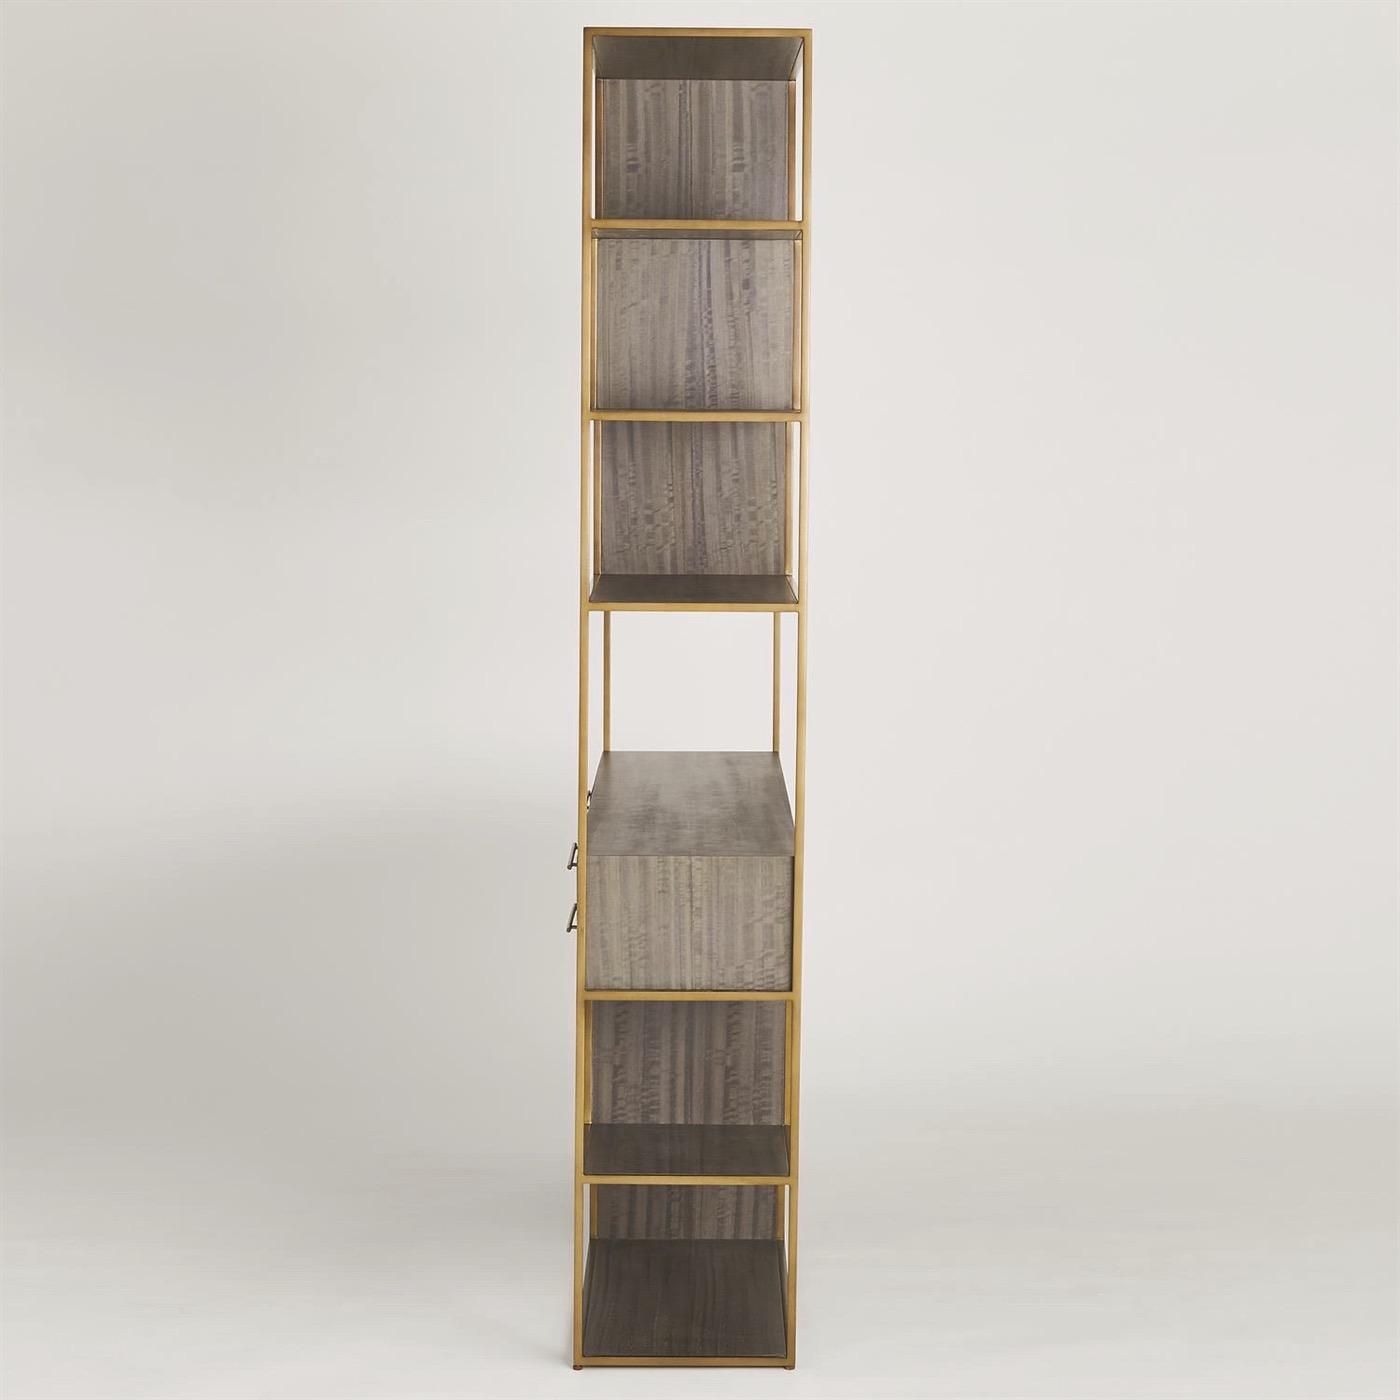 Wayne Bookshelf